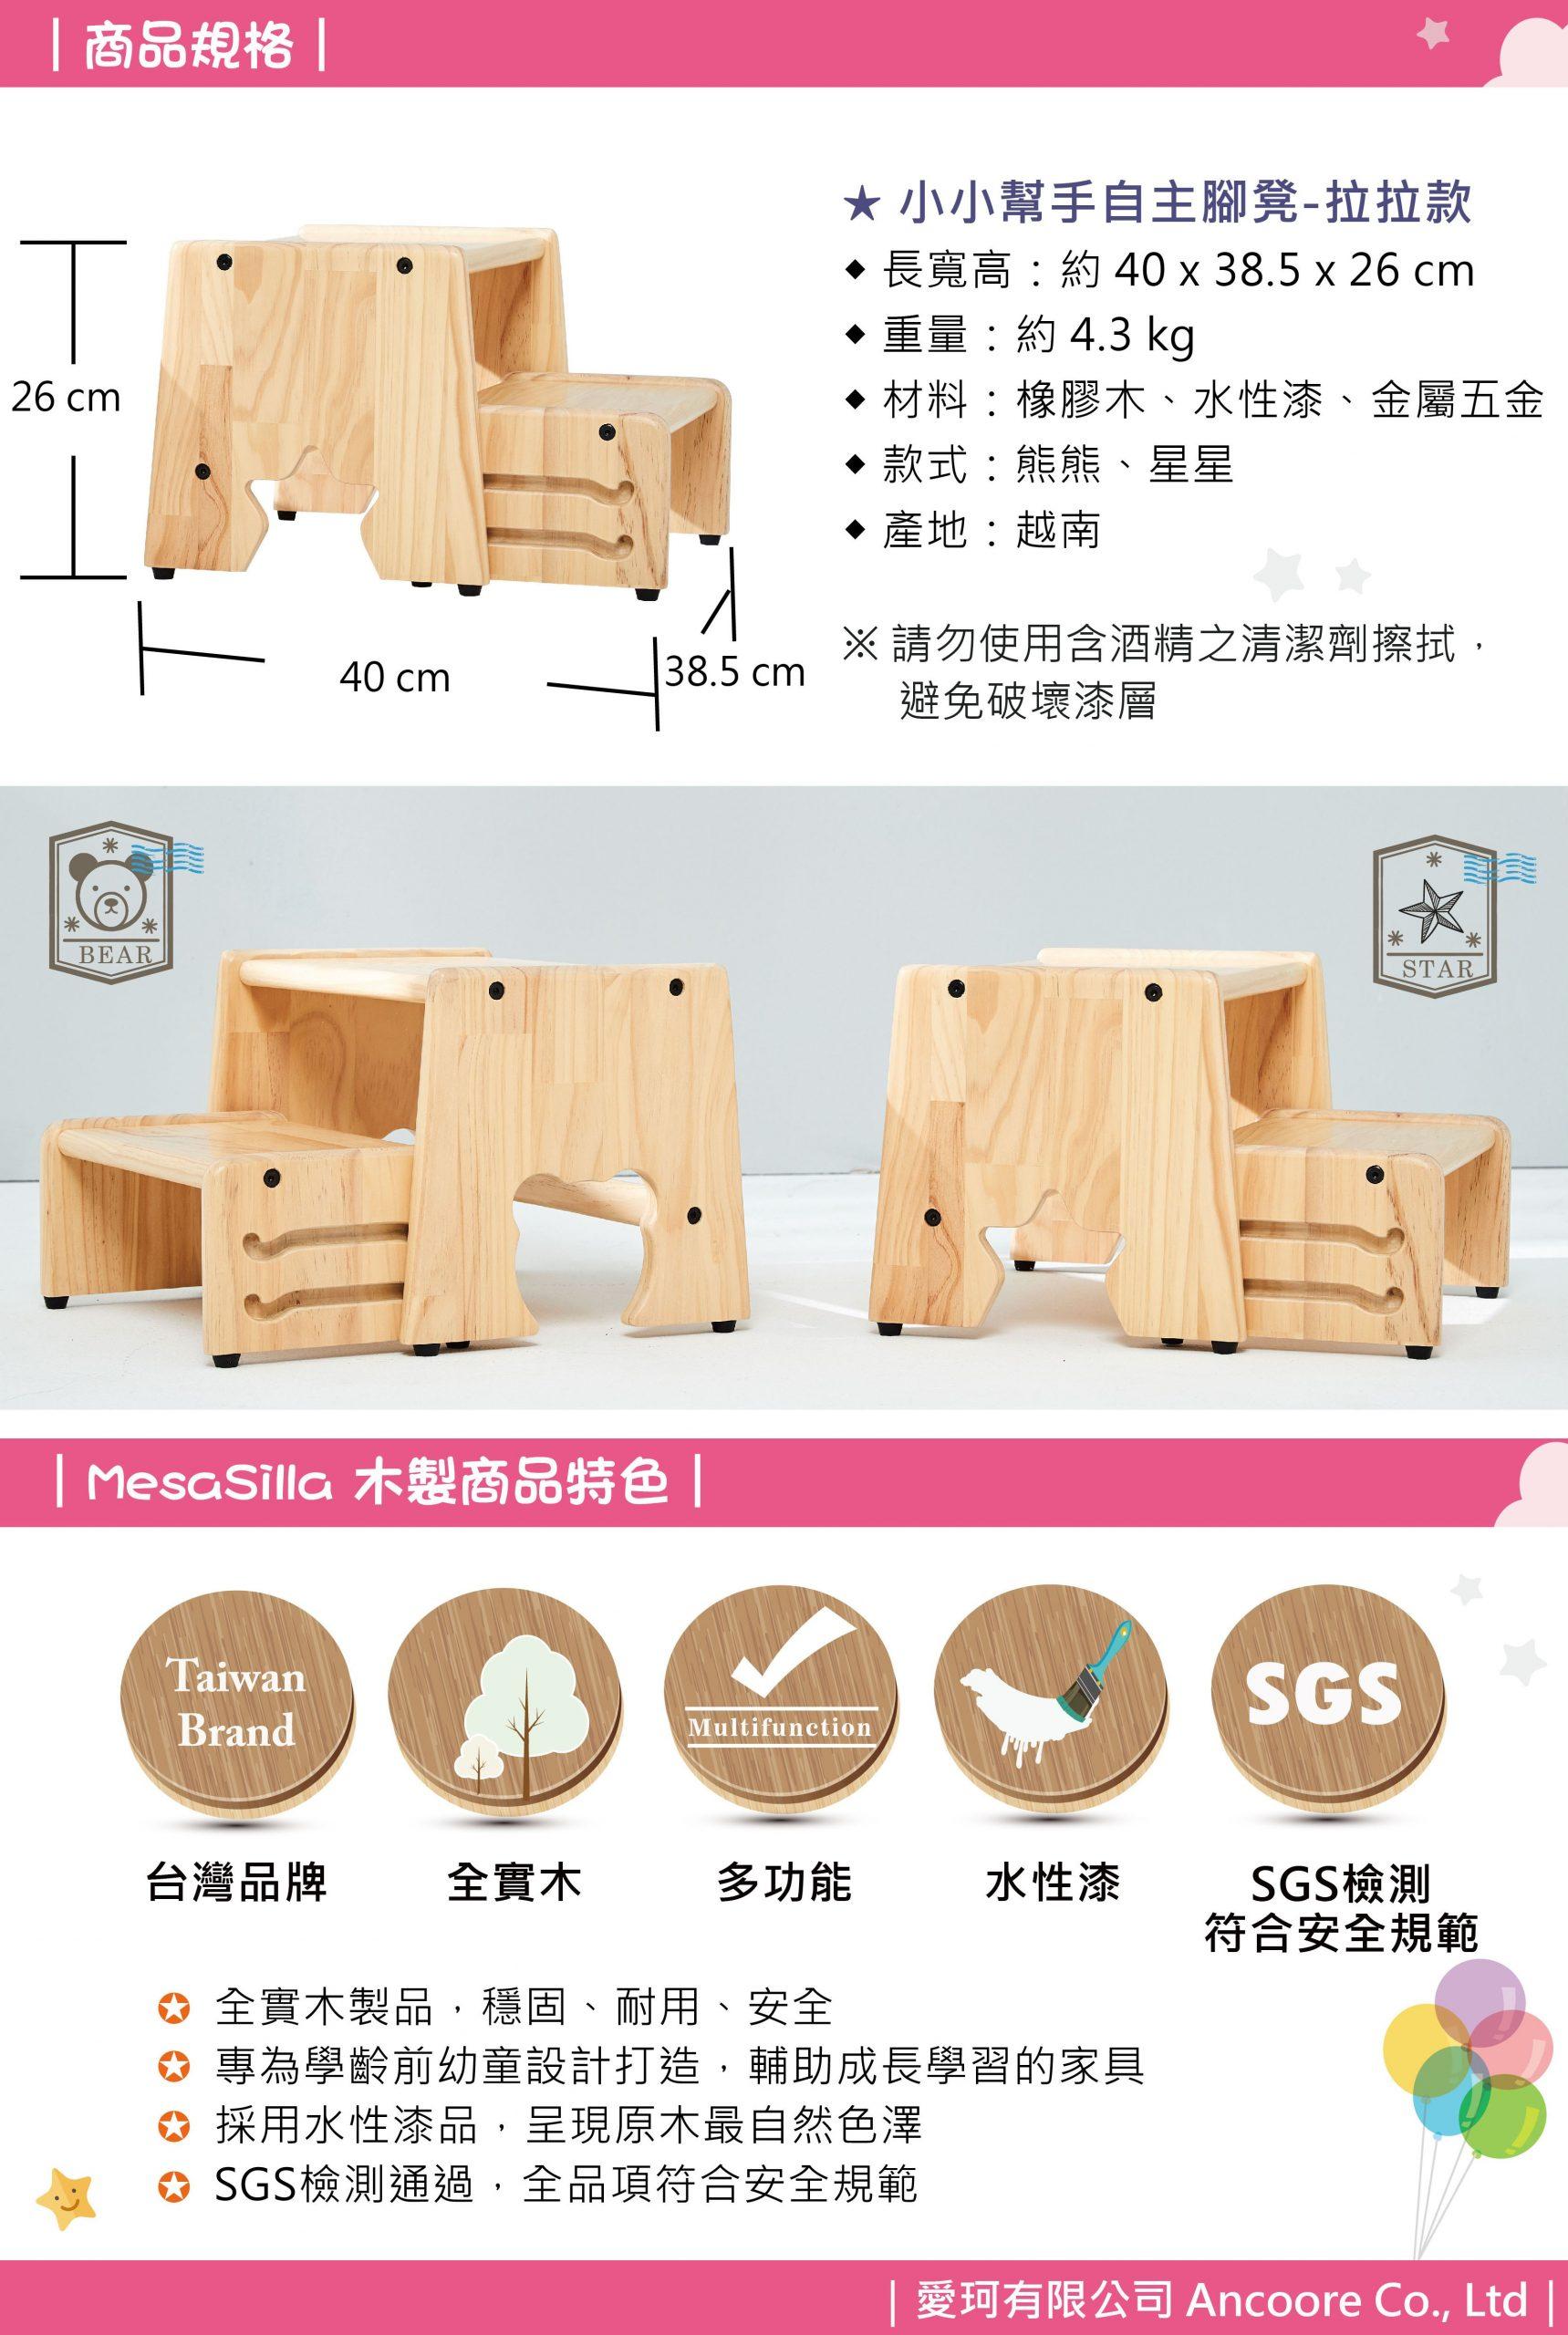 MS-小小幫手自主腳凳-拉拉款(2)